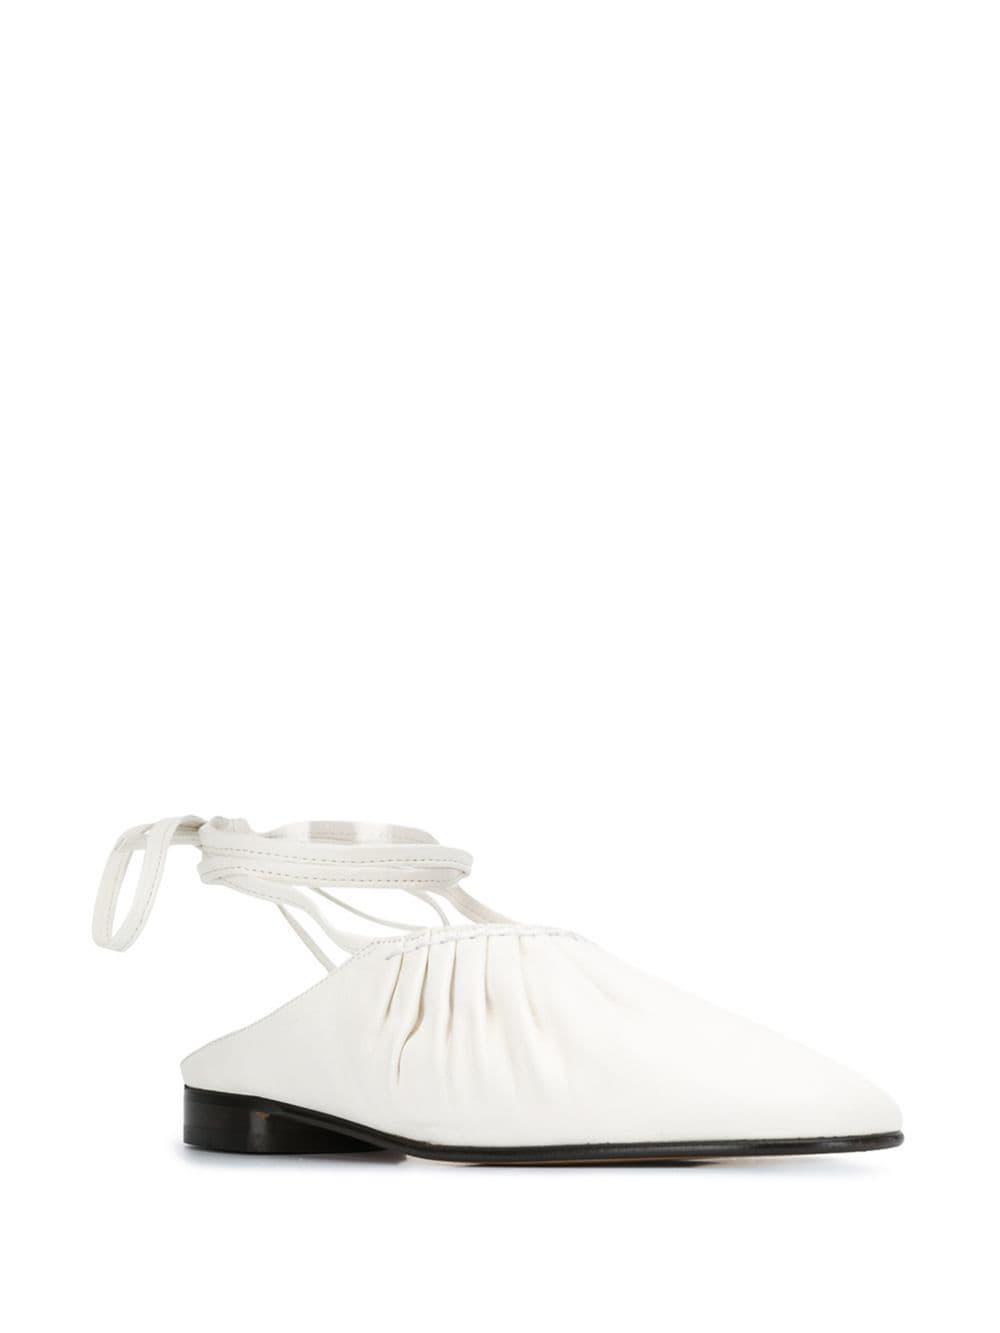 17fad3cd3cb 3.1 Phillip Lim - White Tie Ankle Ballerina Shoes - Lyst. View fullscreen